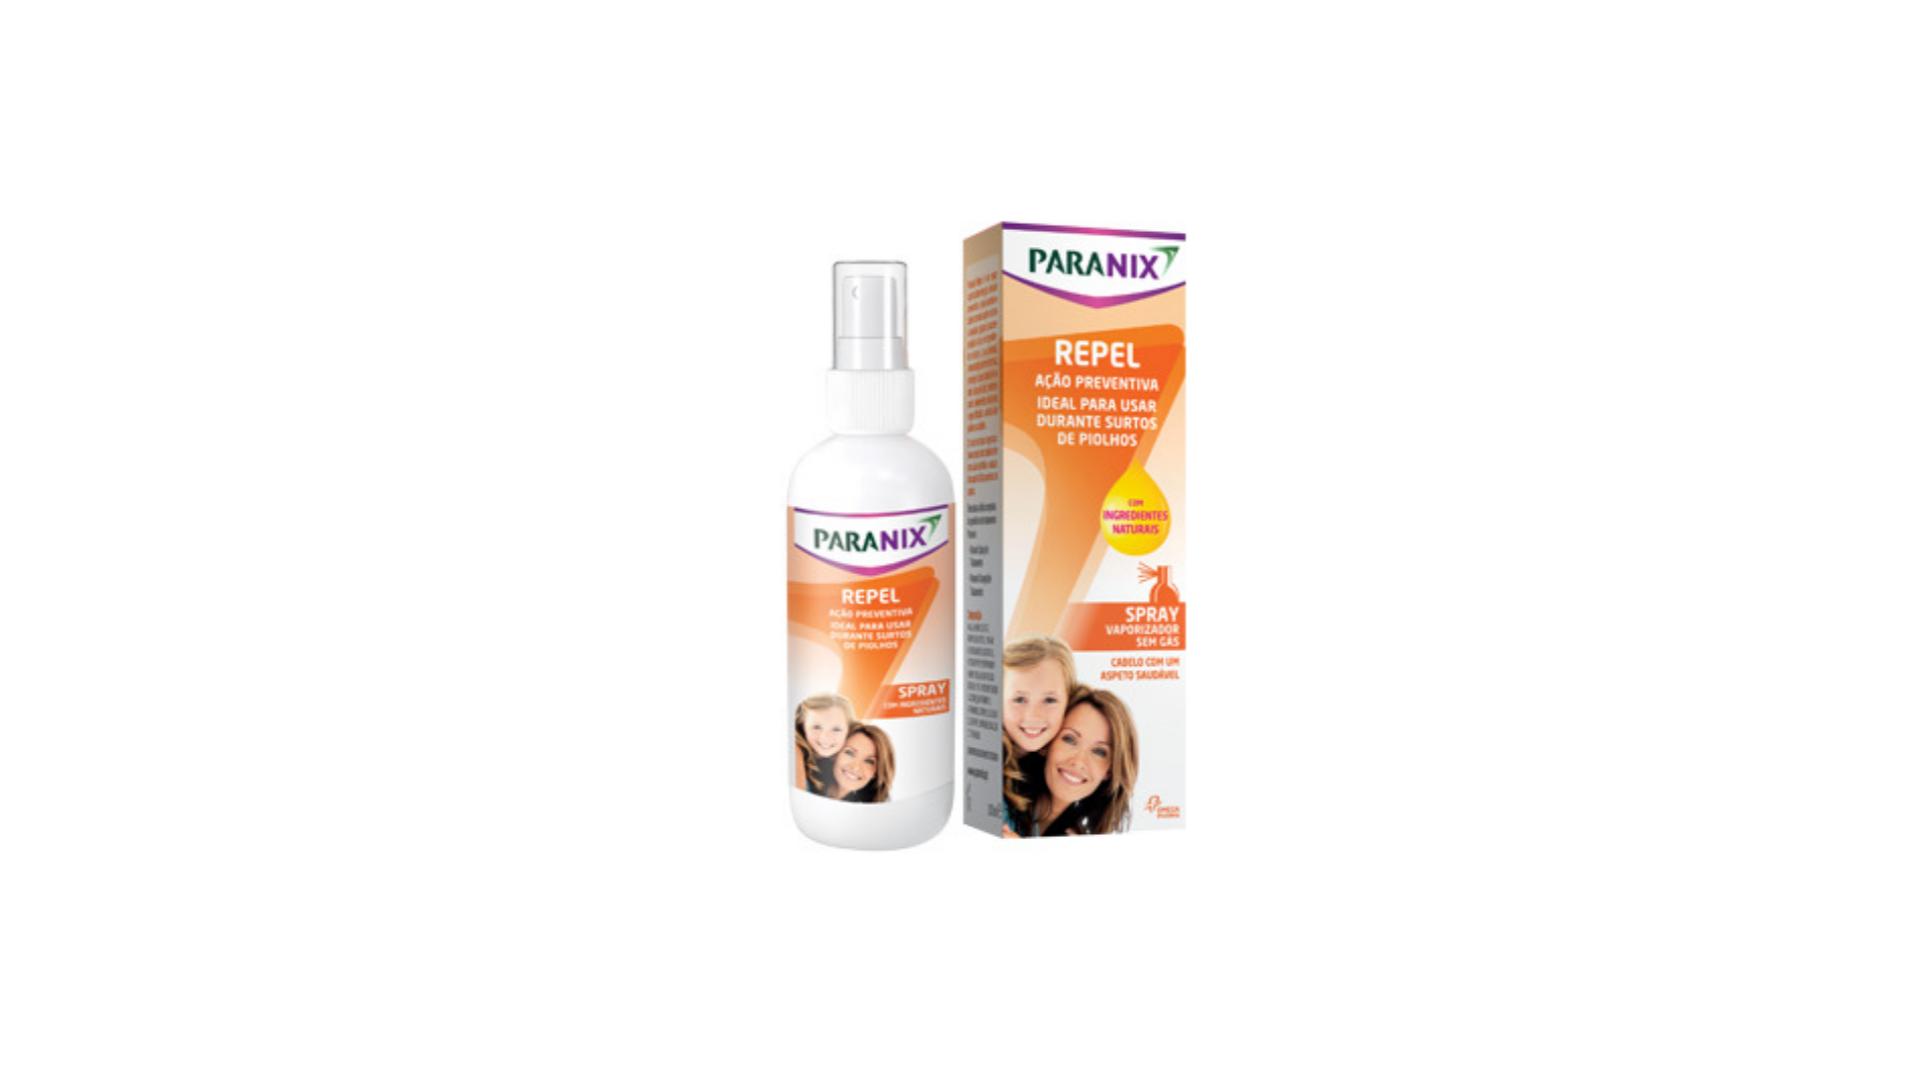 Paranix | Spray Repel 100ml